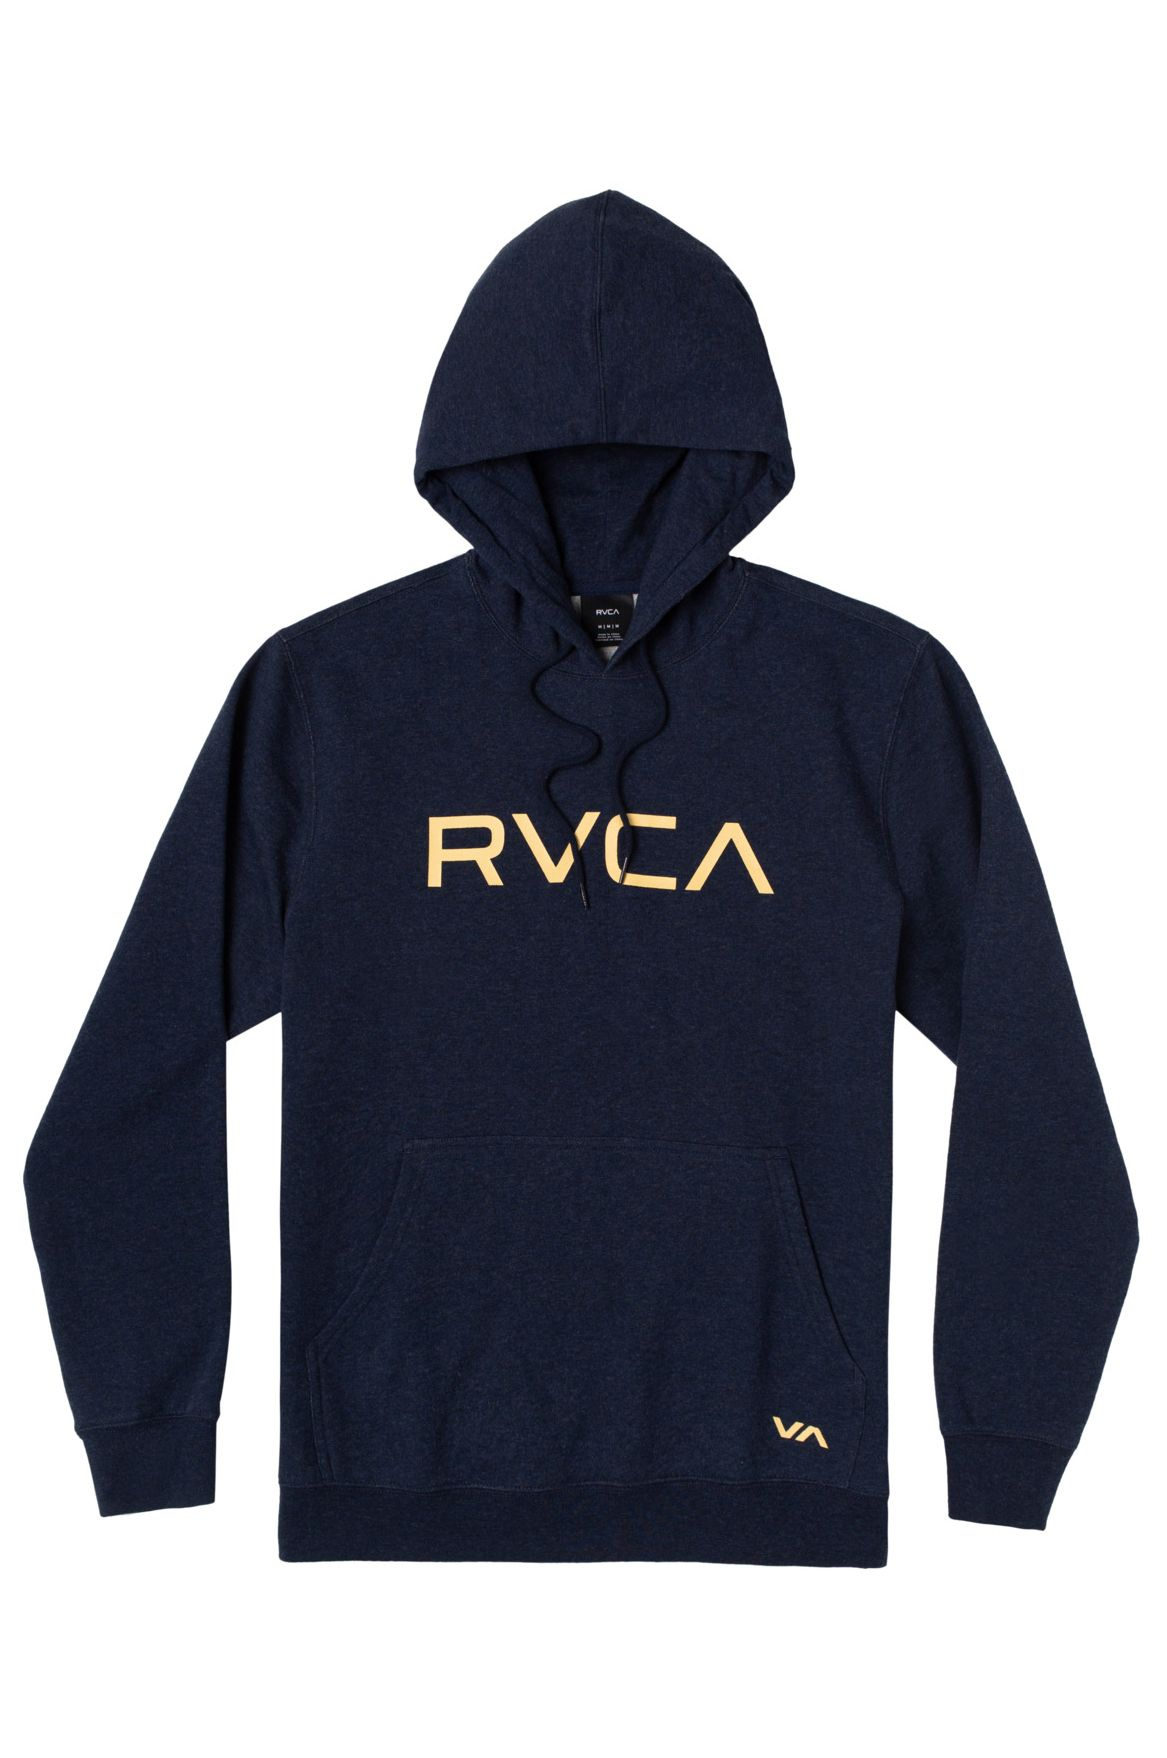 RVCA Sweat Hood BIG RVCA Navy Heather